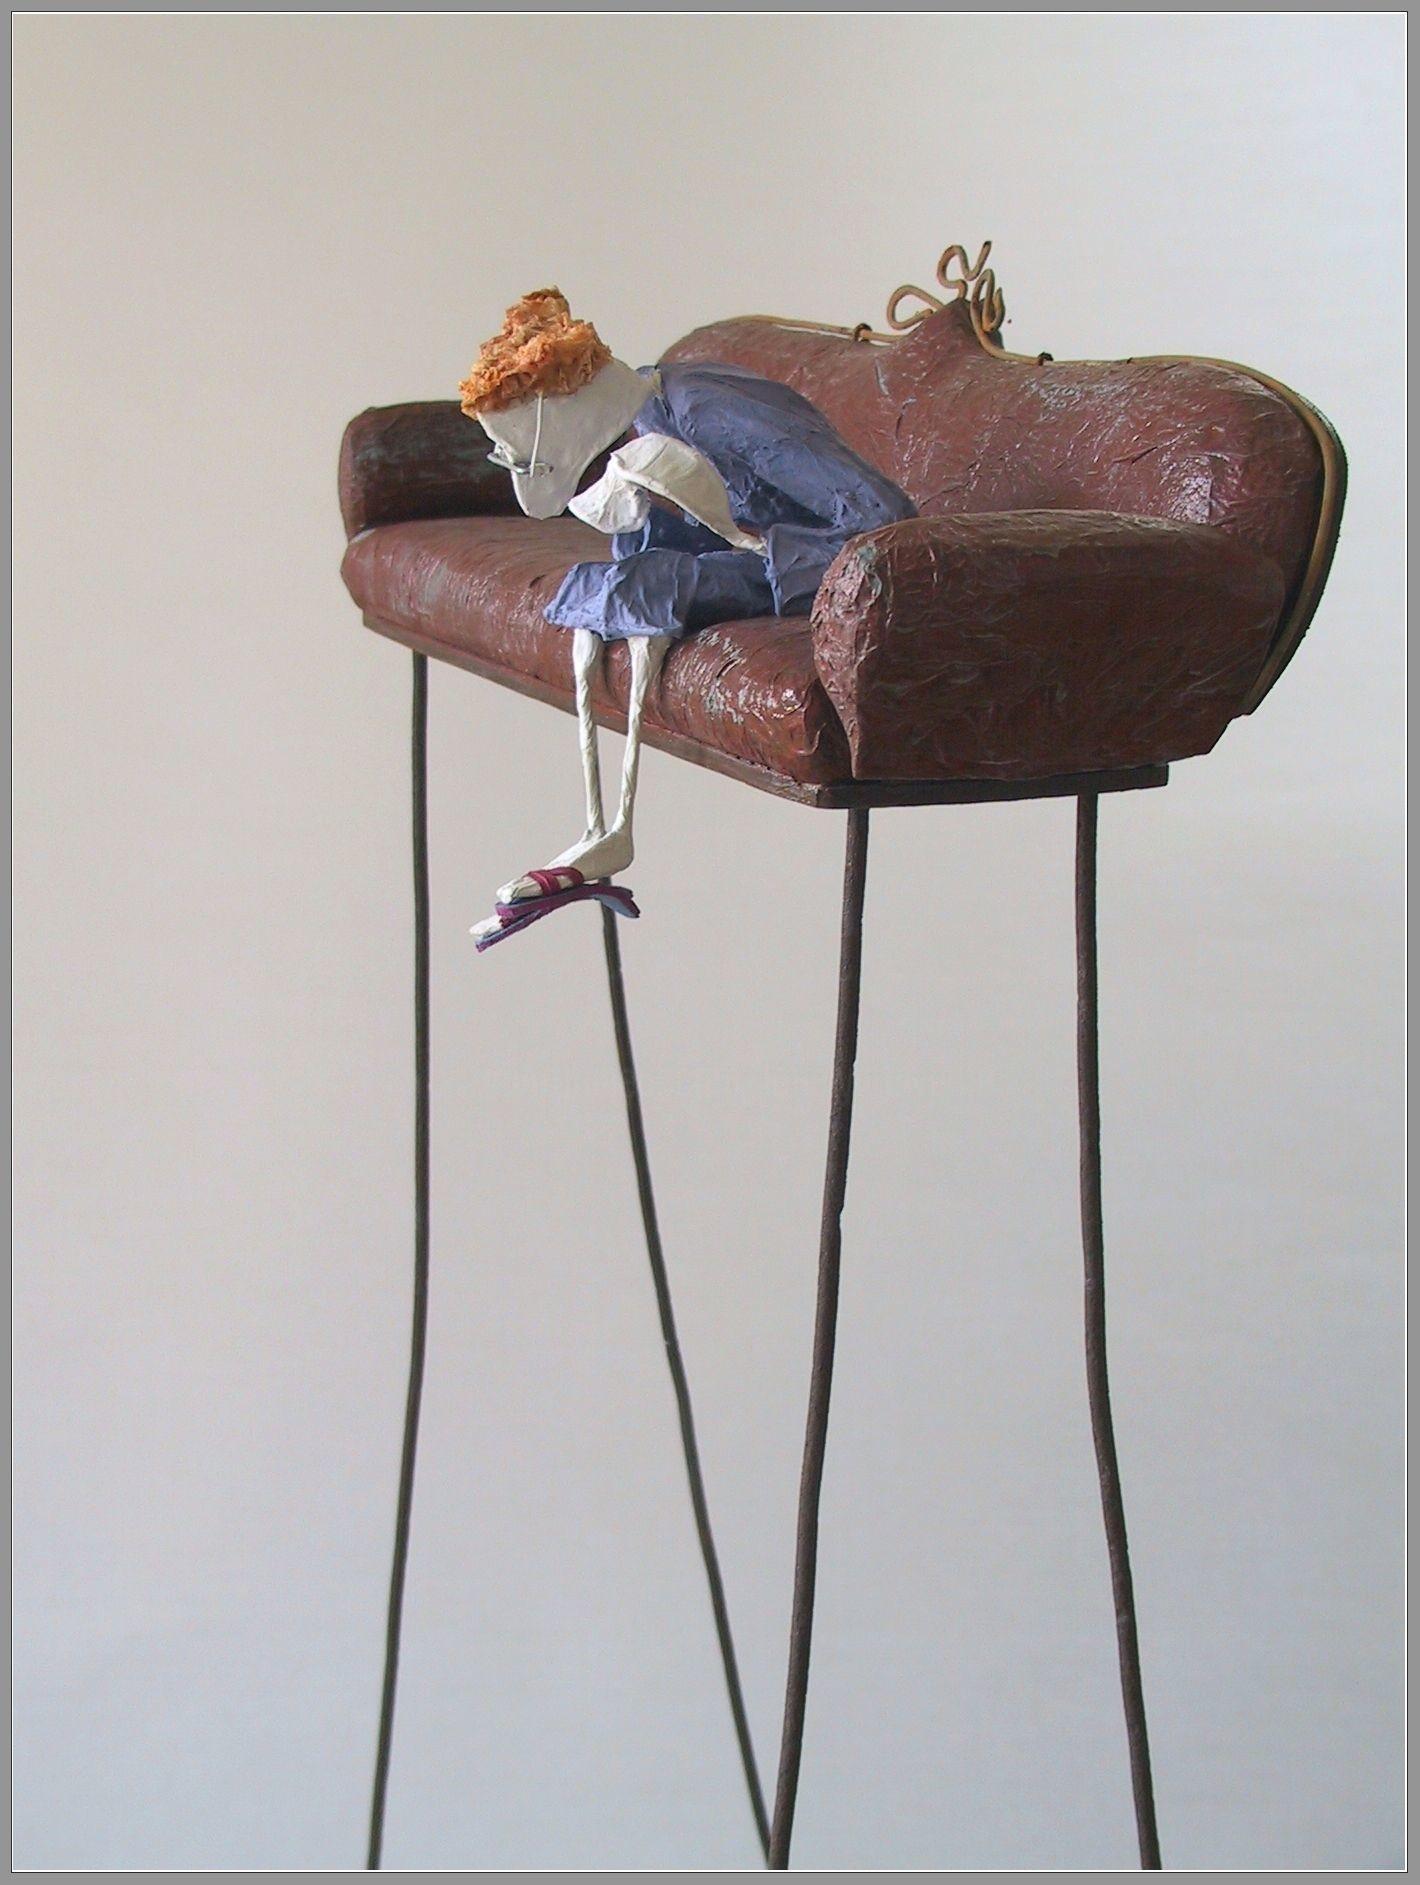 JEAN-YVES VERNE - sculpture - Vertige psychanalytique (Détail)